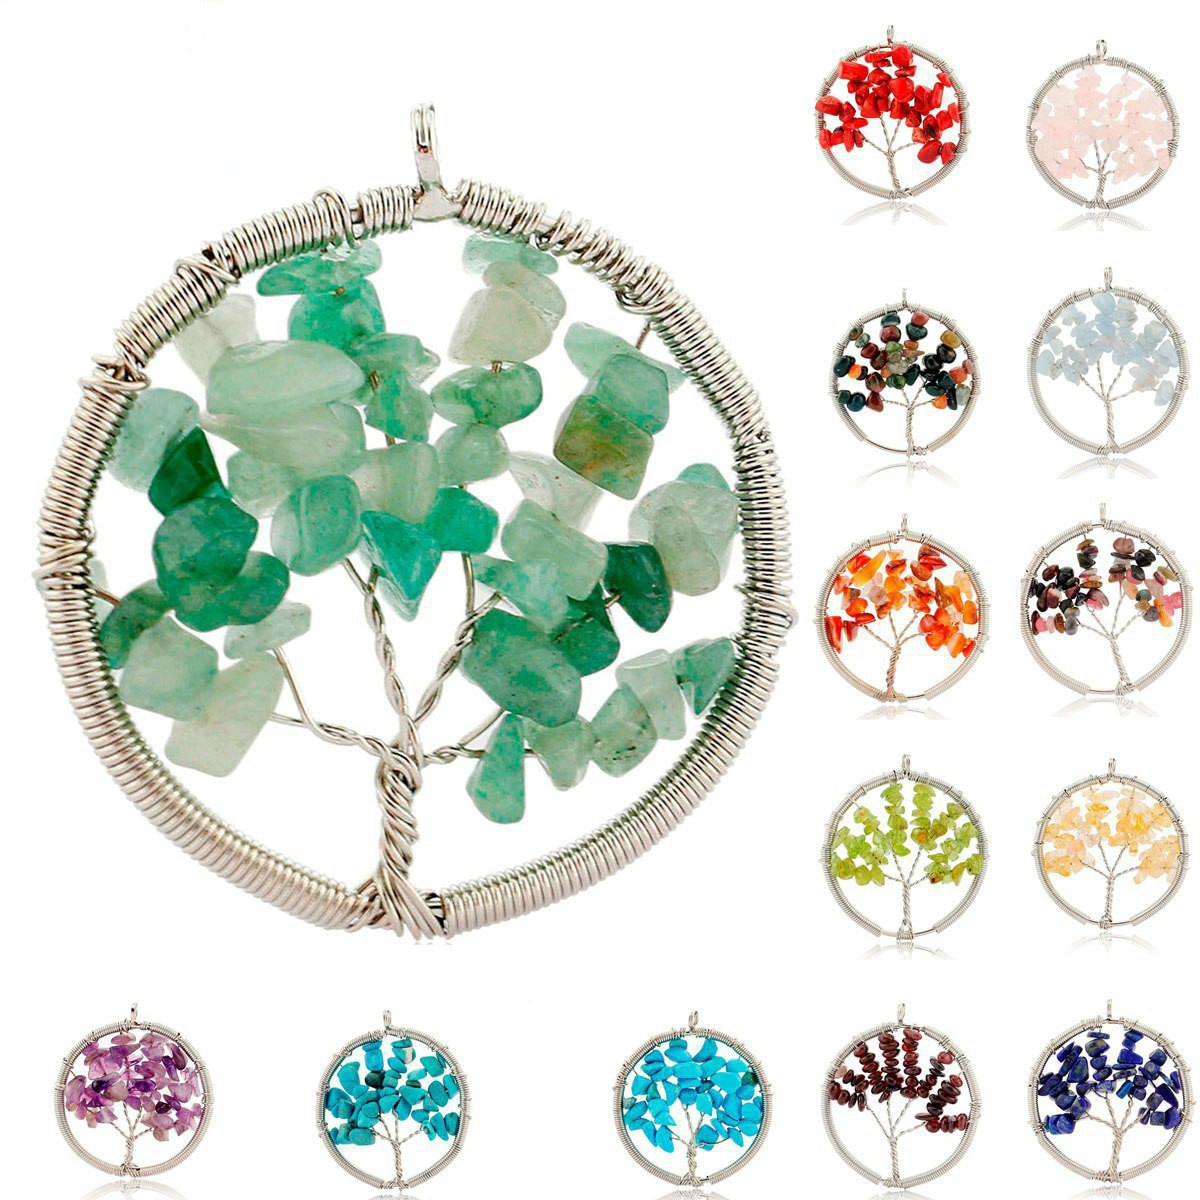 Grava de cristal Natural Árbol de la vida colgante hecho a mano alambre envuelto redondo collar Reiki péndulo de joyería accesorios para mujer regalo